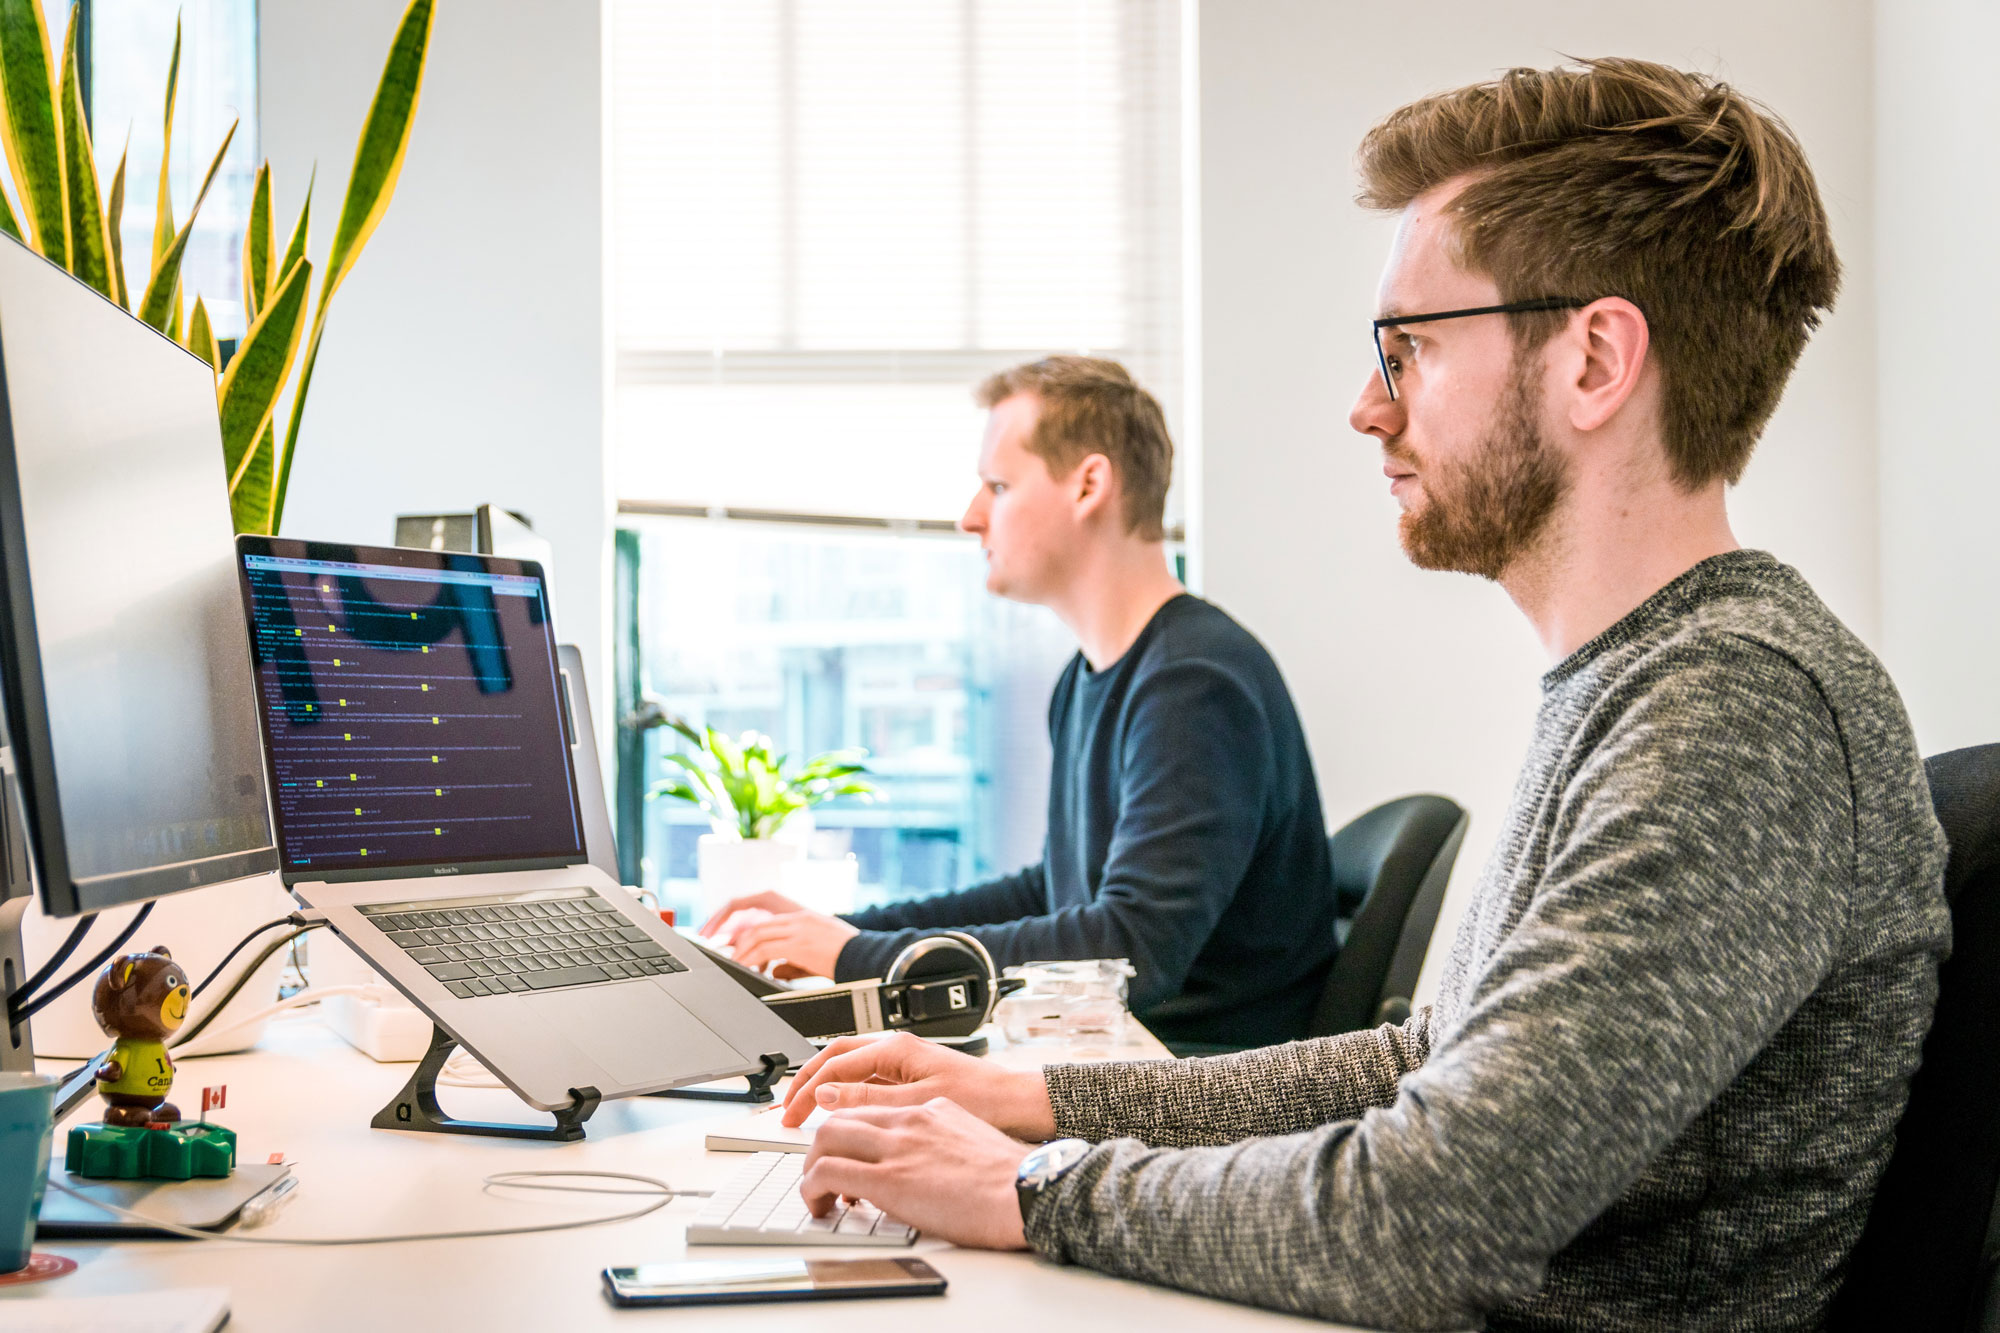 Website development services in the UK